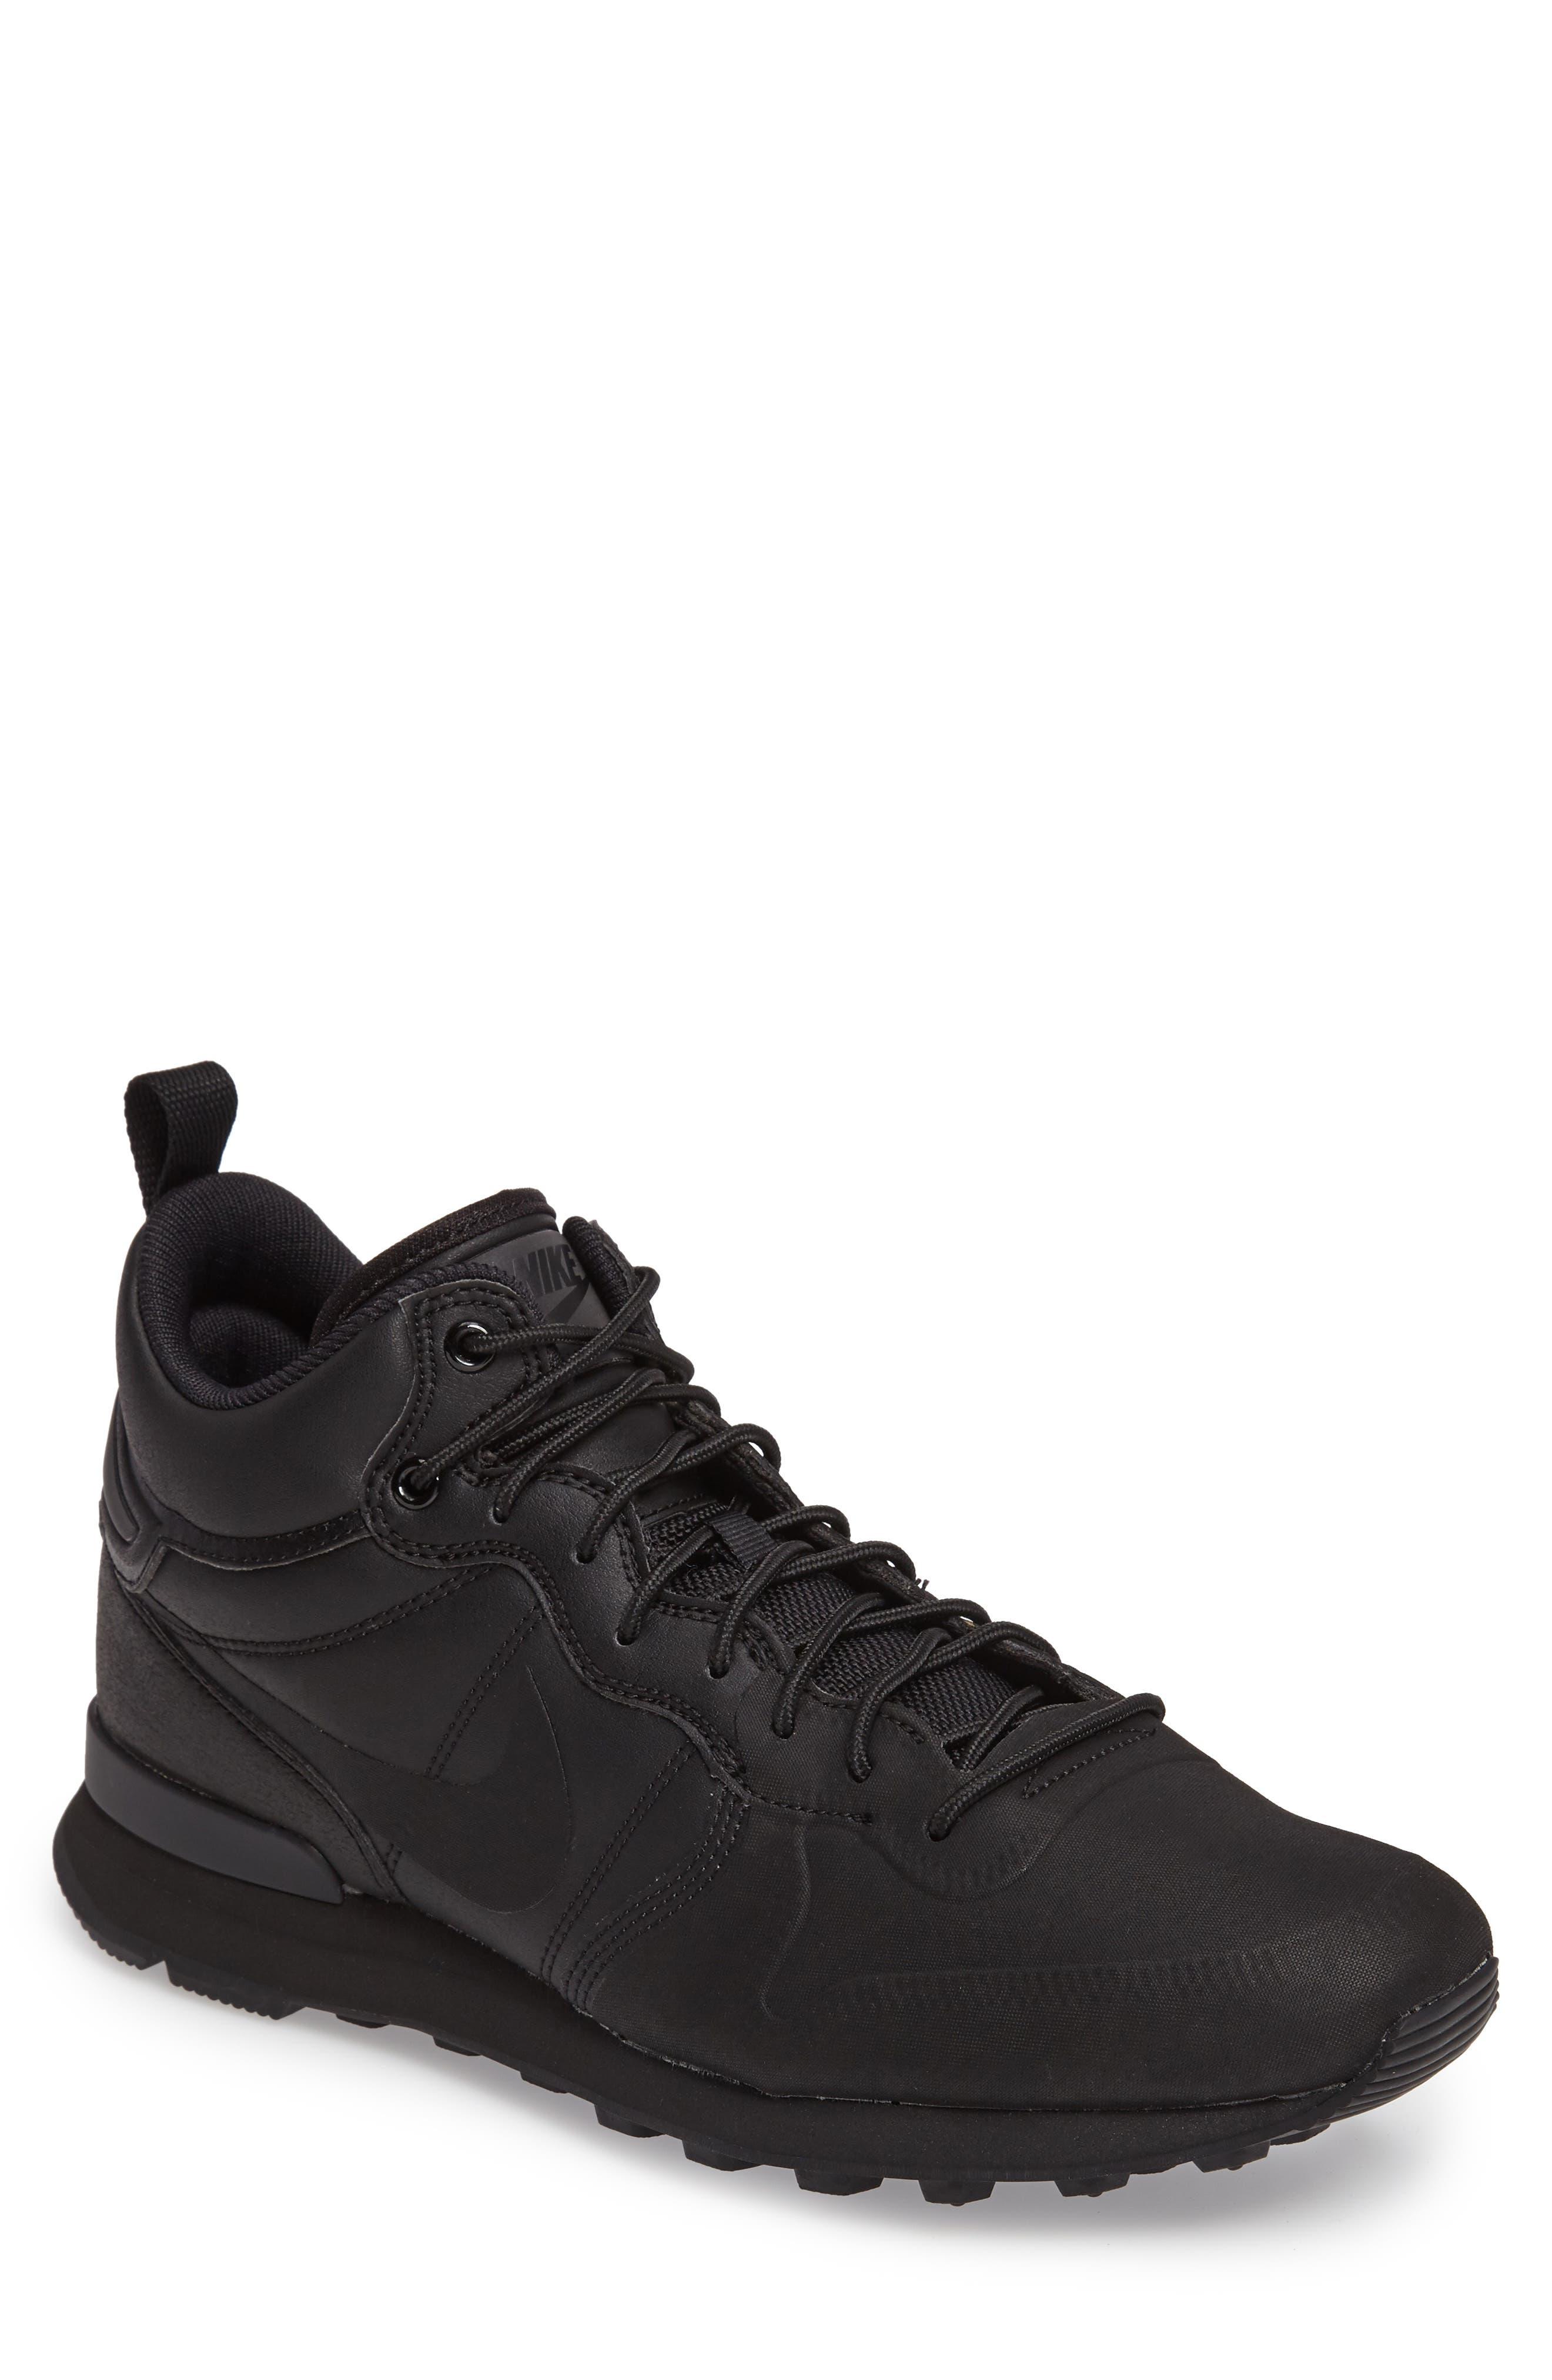 Internationalist Utility Sneaker,                         Main,                         color, 001